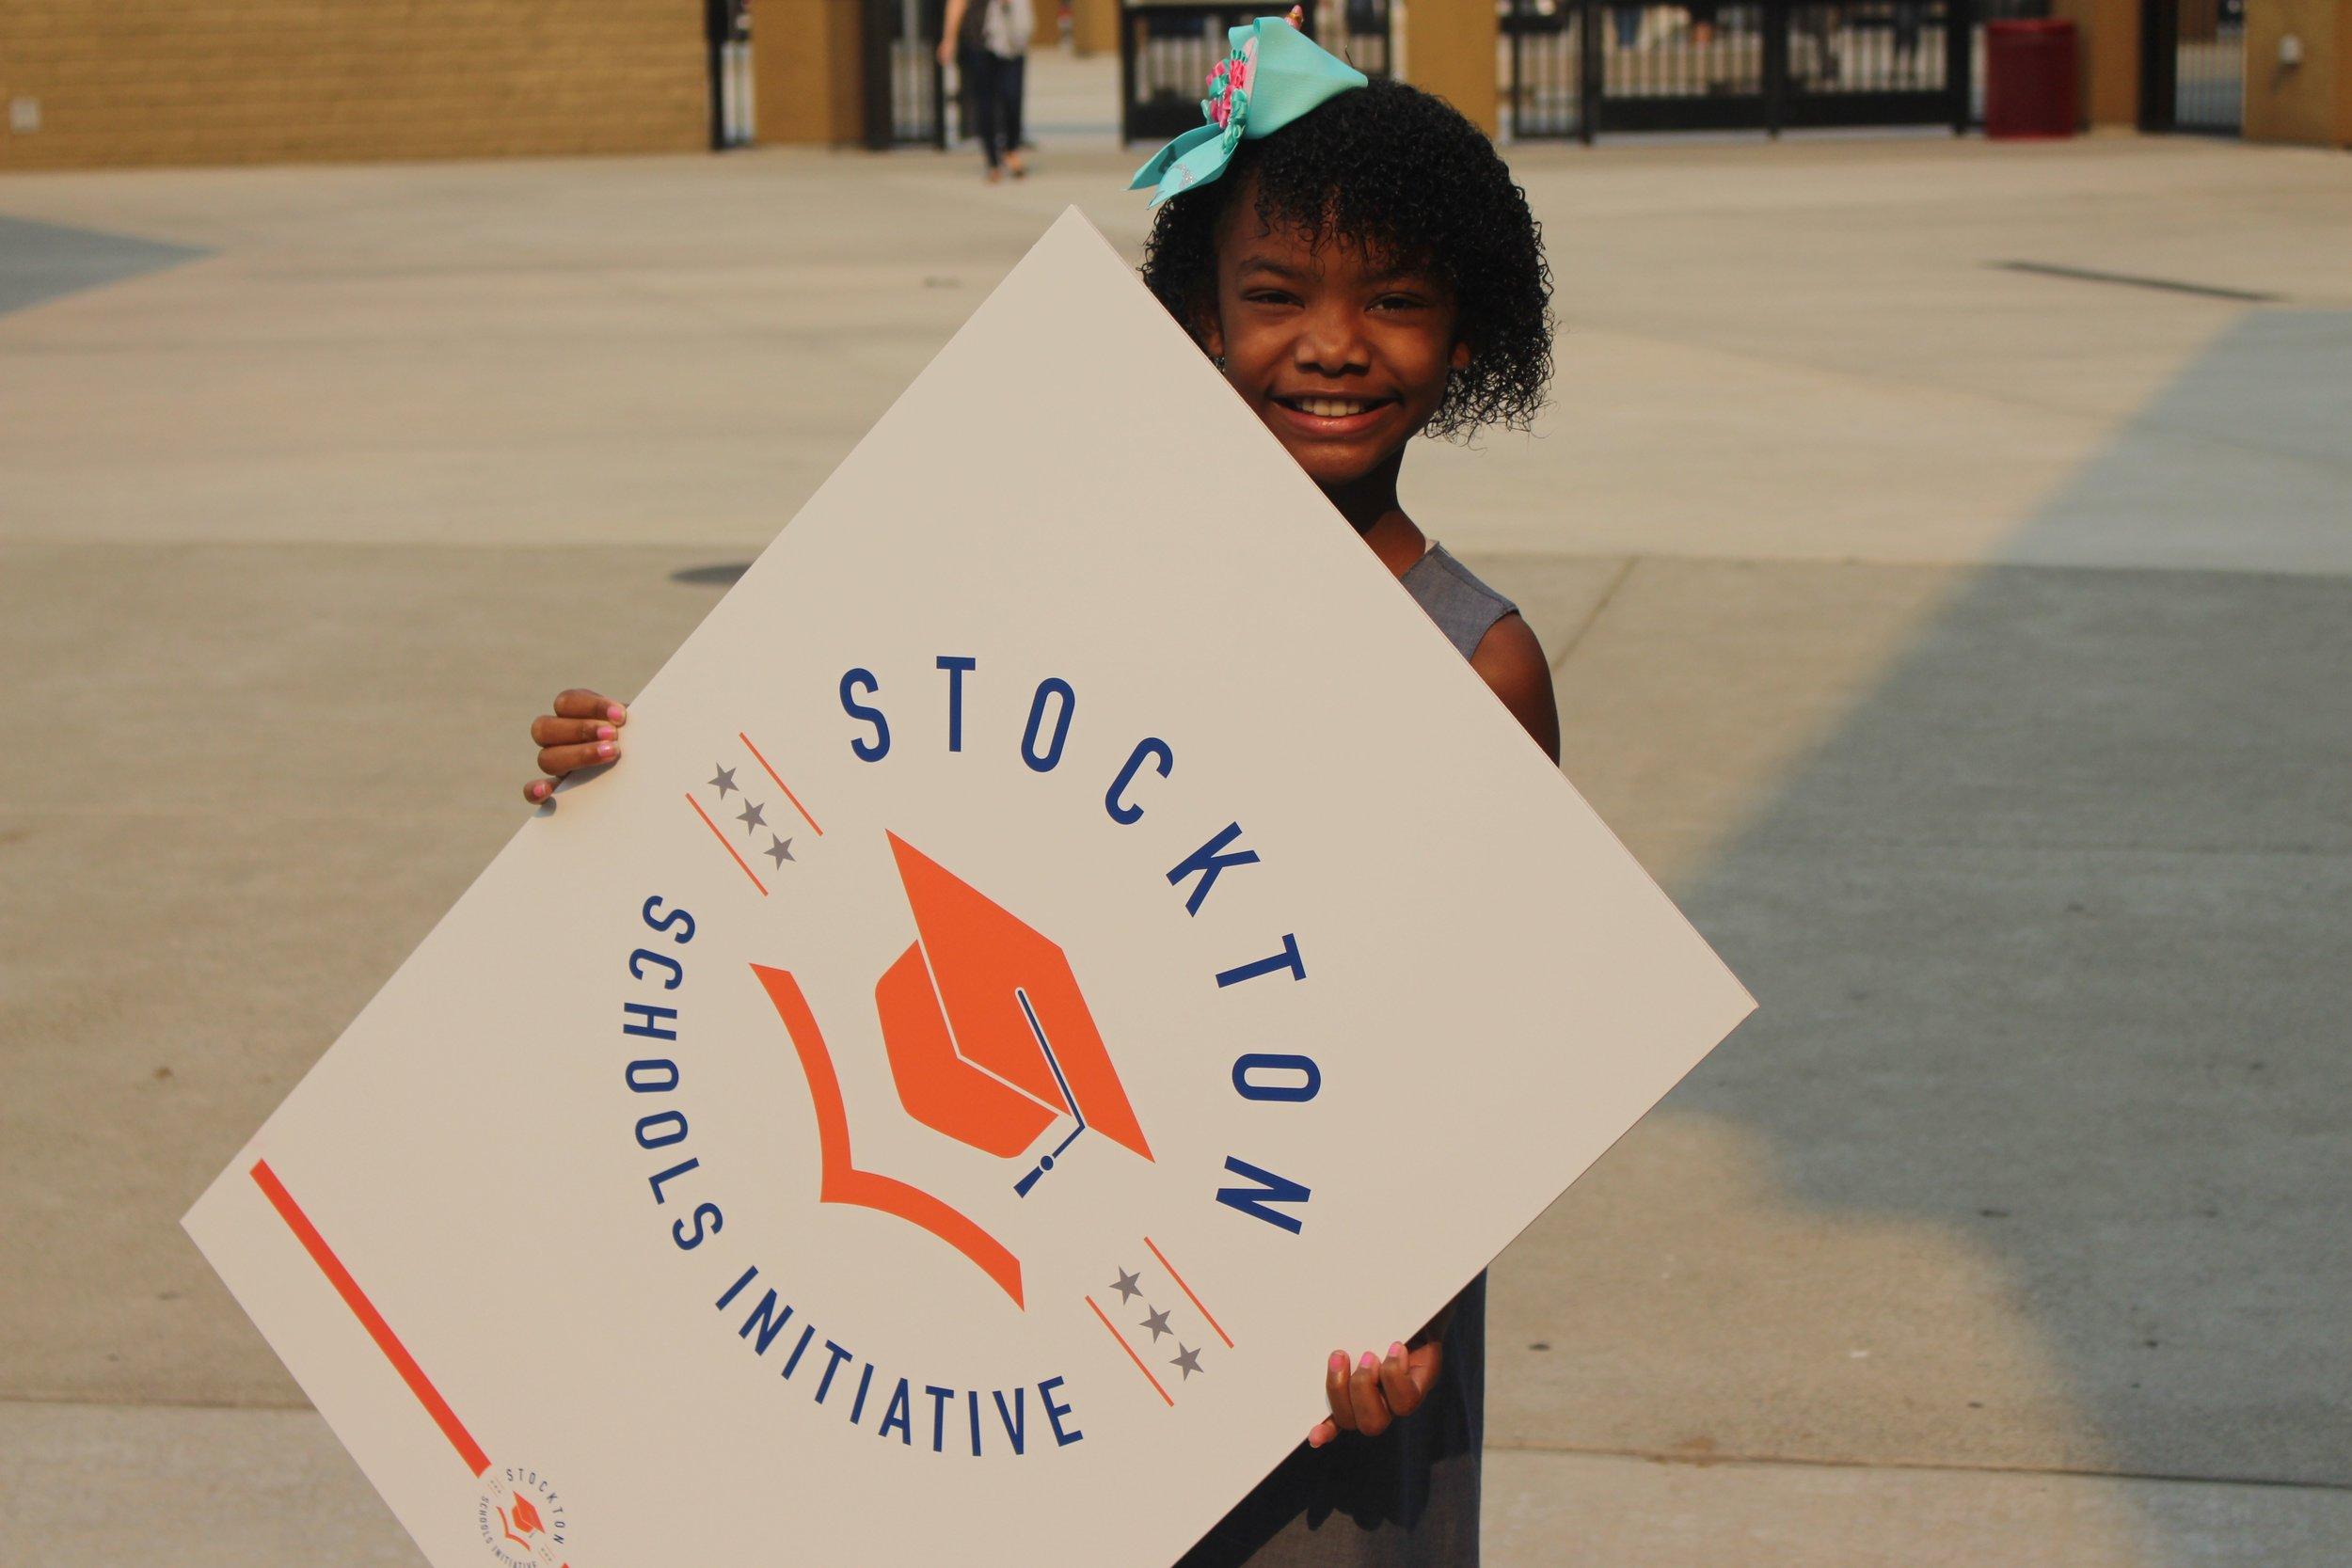 child with Stkn Sch Initiative logo.jpg